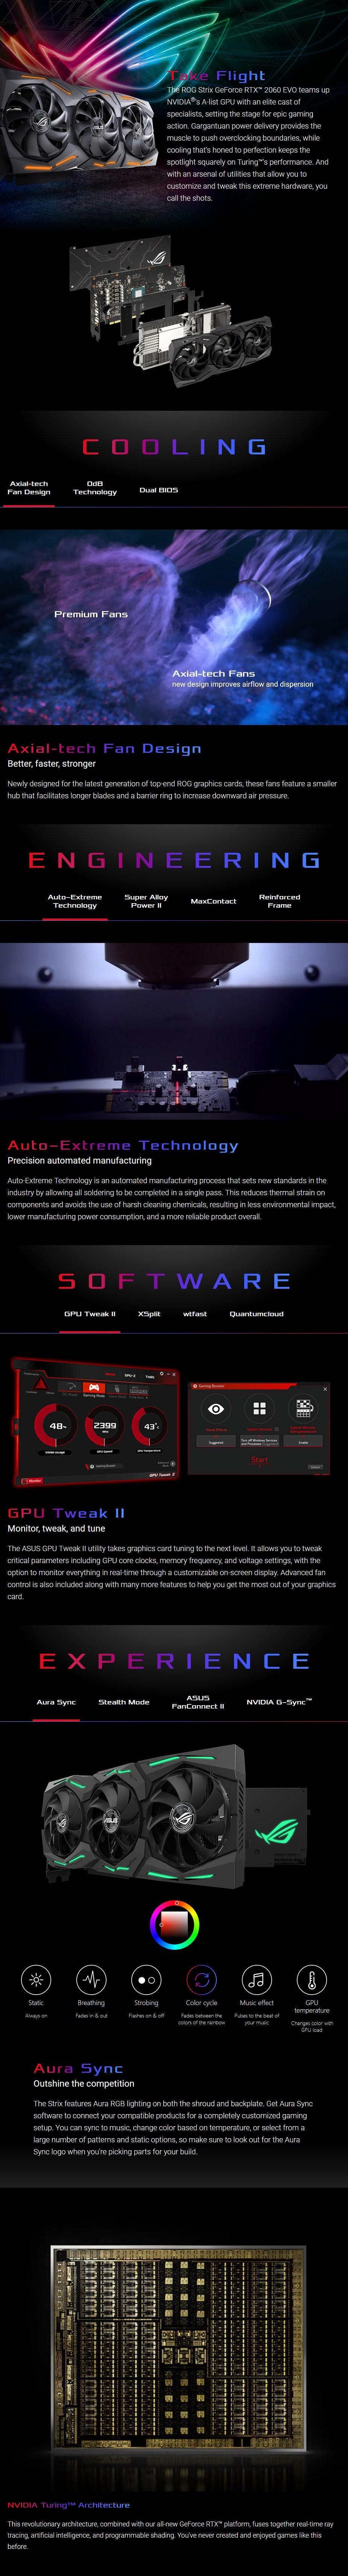 asus-geforce-rtx-2060-rog-strix-evo-gaming-oc-6gb-video-card-ac33957-7.jpg